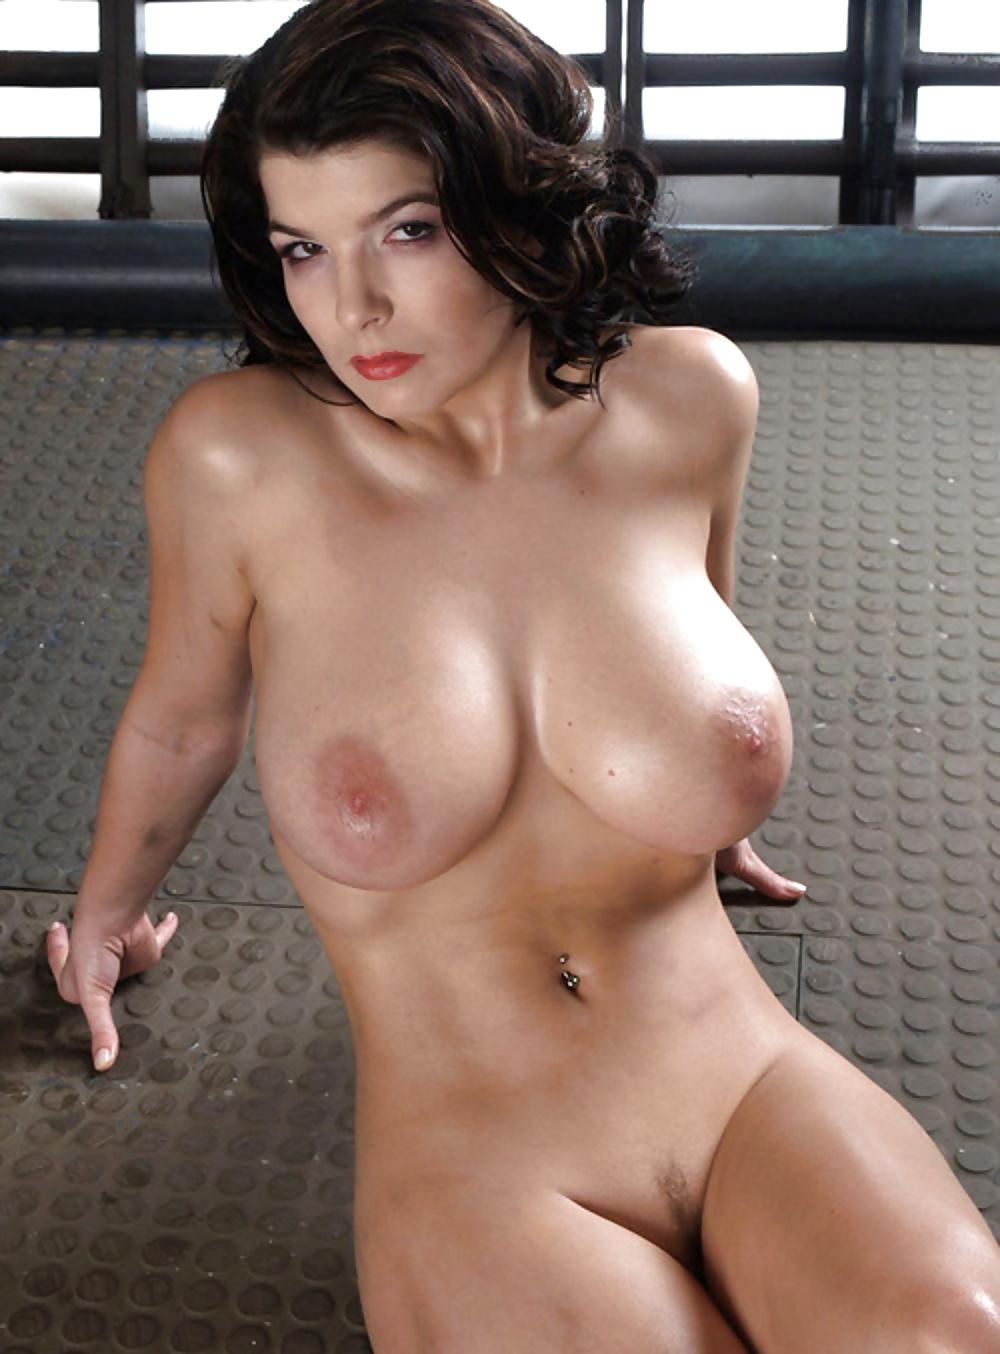 Hot milfs nice tits